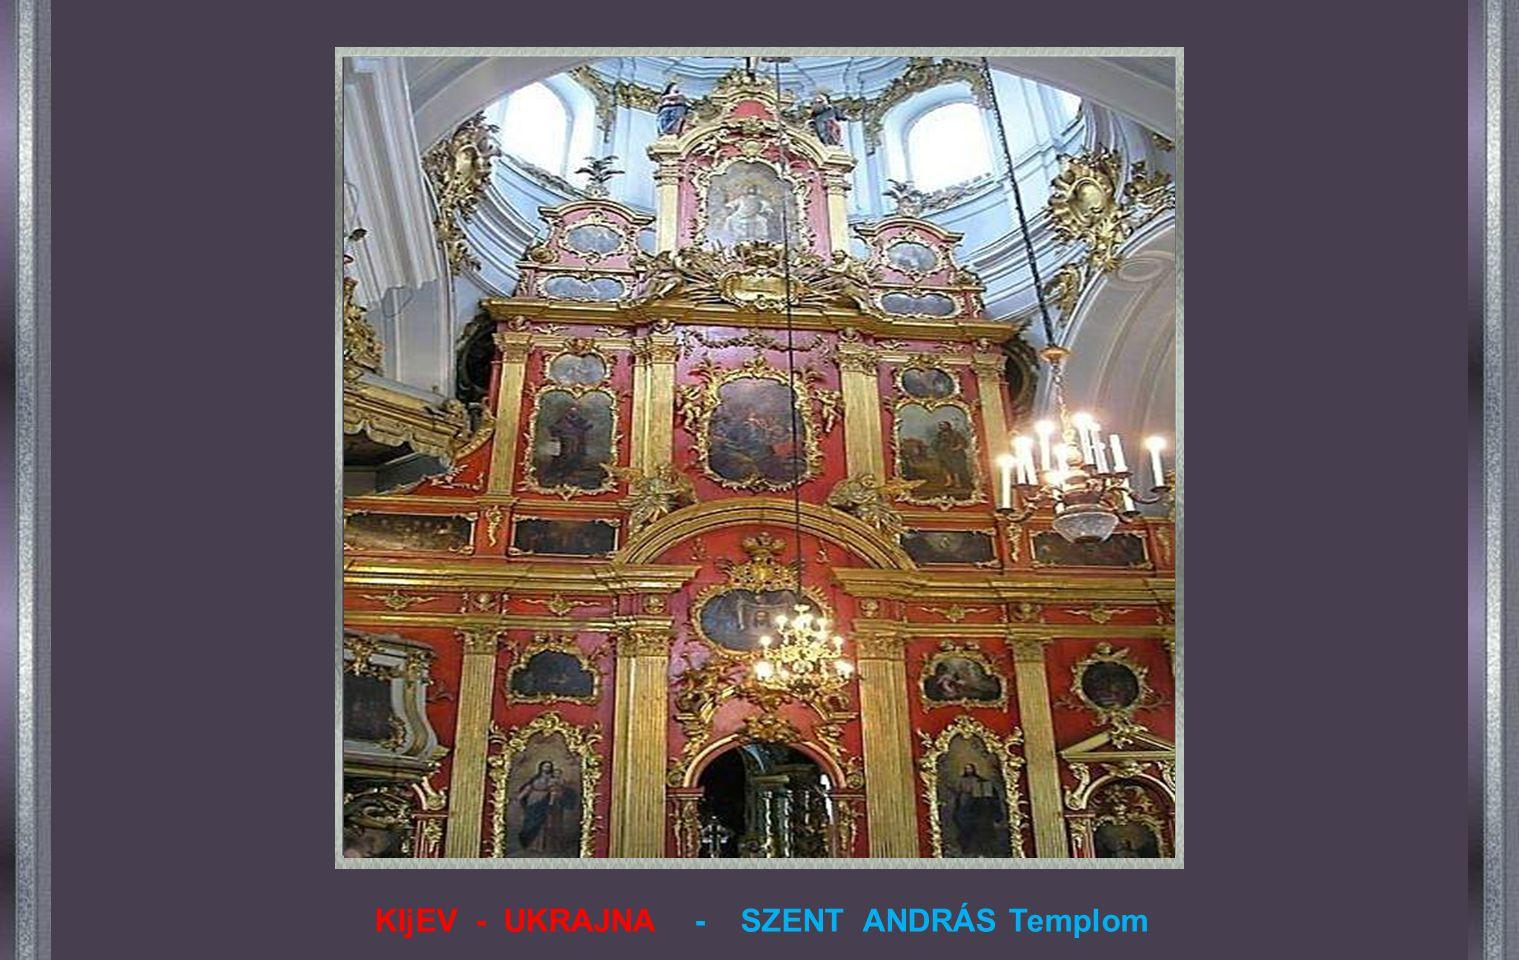 KIjEV - UKRAJNA - SZENT ANDRÁS Templom